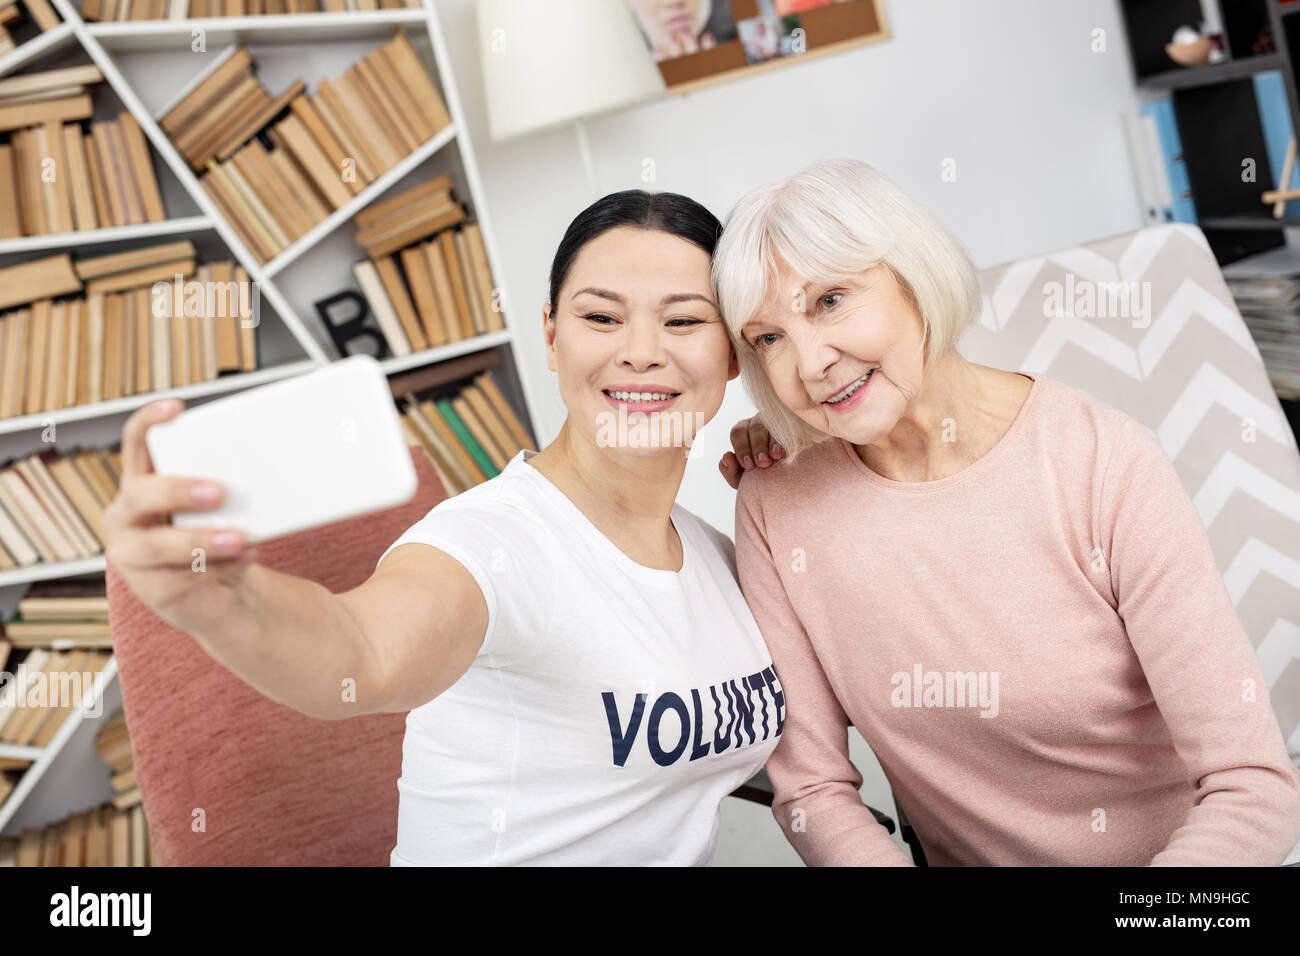 Joyful volunteer and senior woman taking selfie - Stock Image